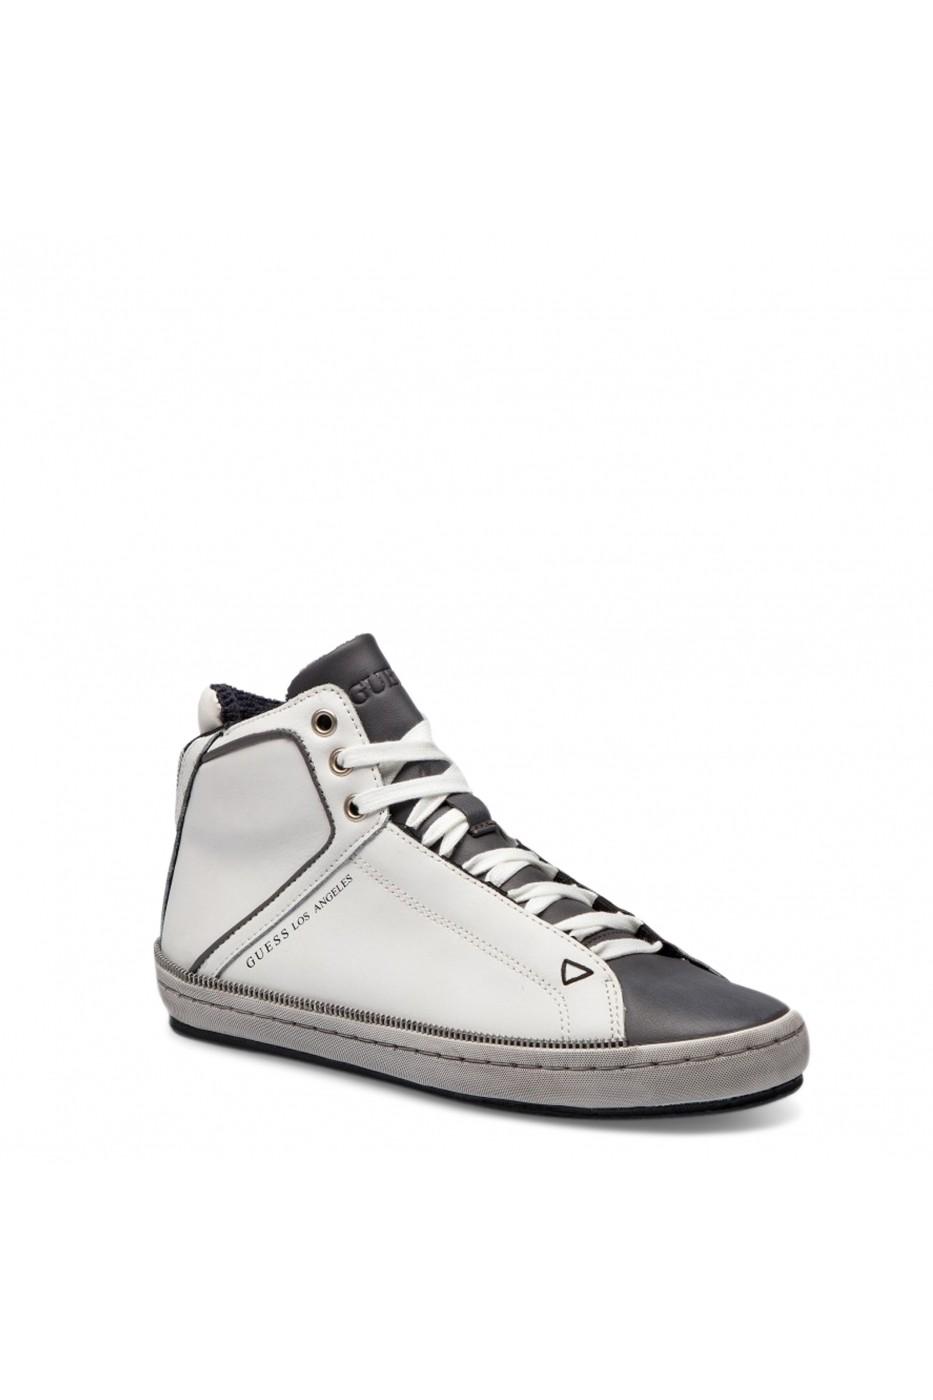 Guess Sportcipő FMMID4LEA12 WHITE - FashionUP! 79b4b36343